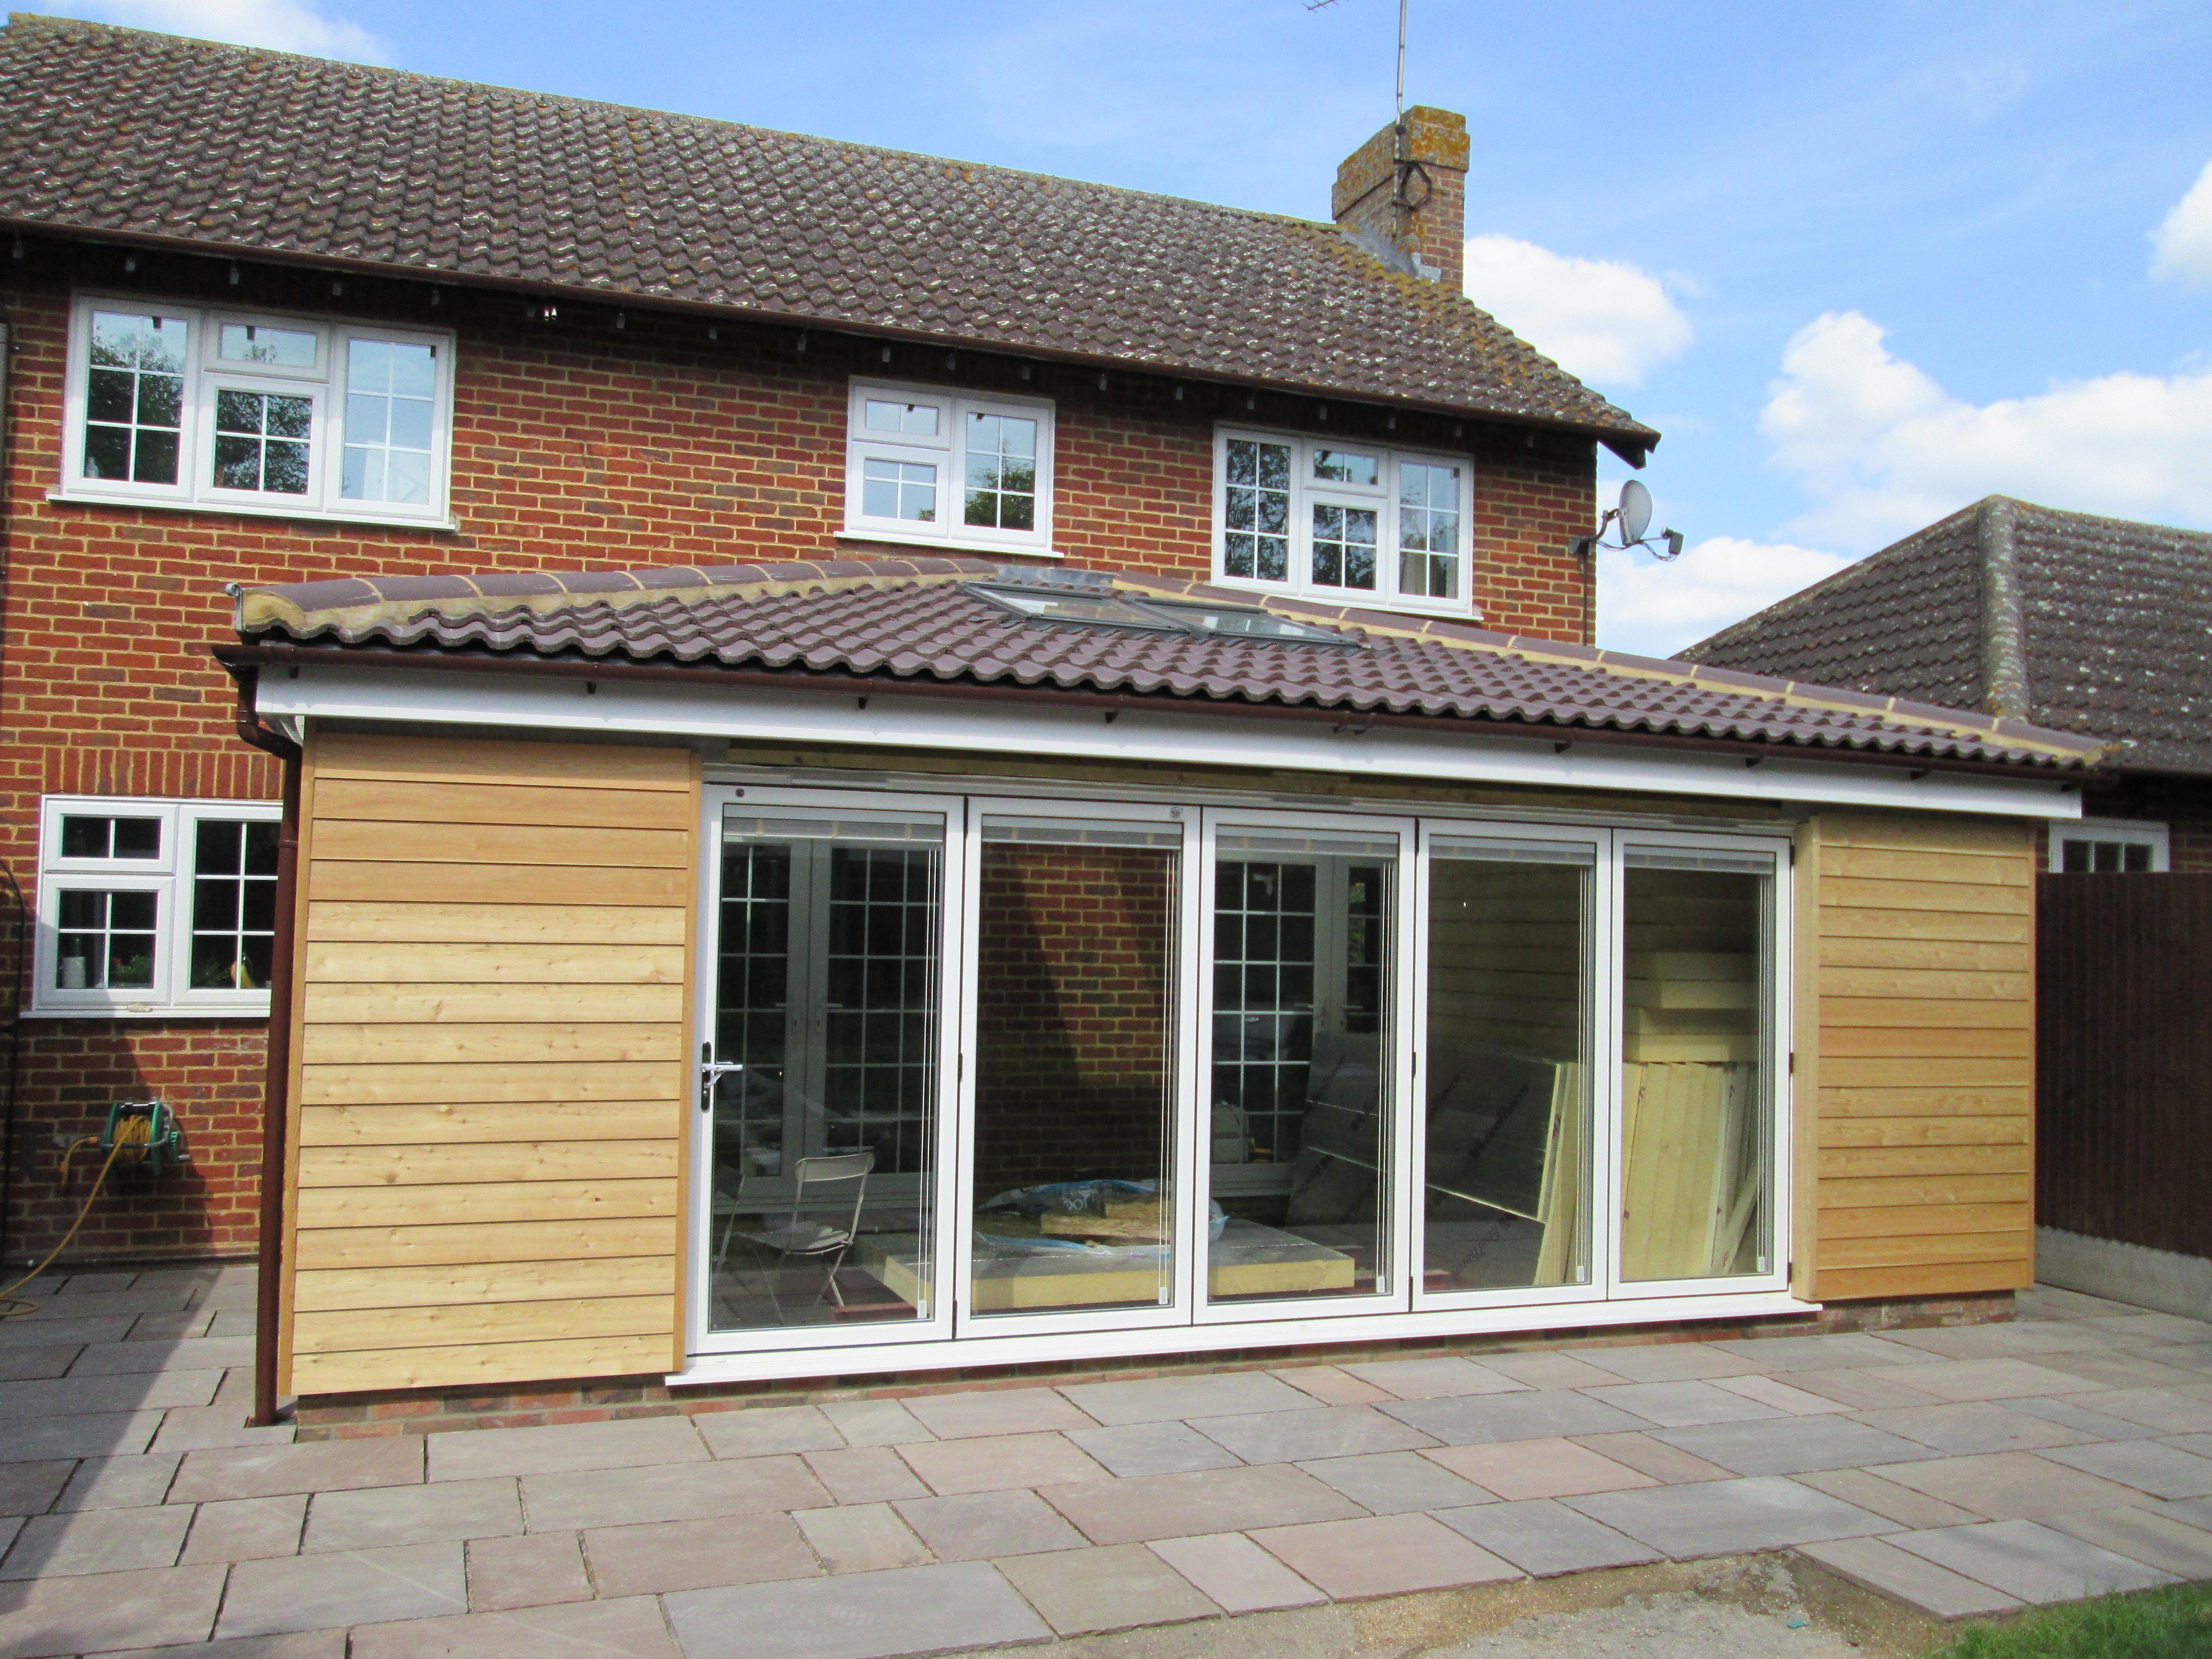 timber clad slate roof extension designs google search. Black Bedroom Furniture Sets. Home Design Ideas